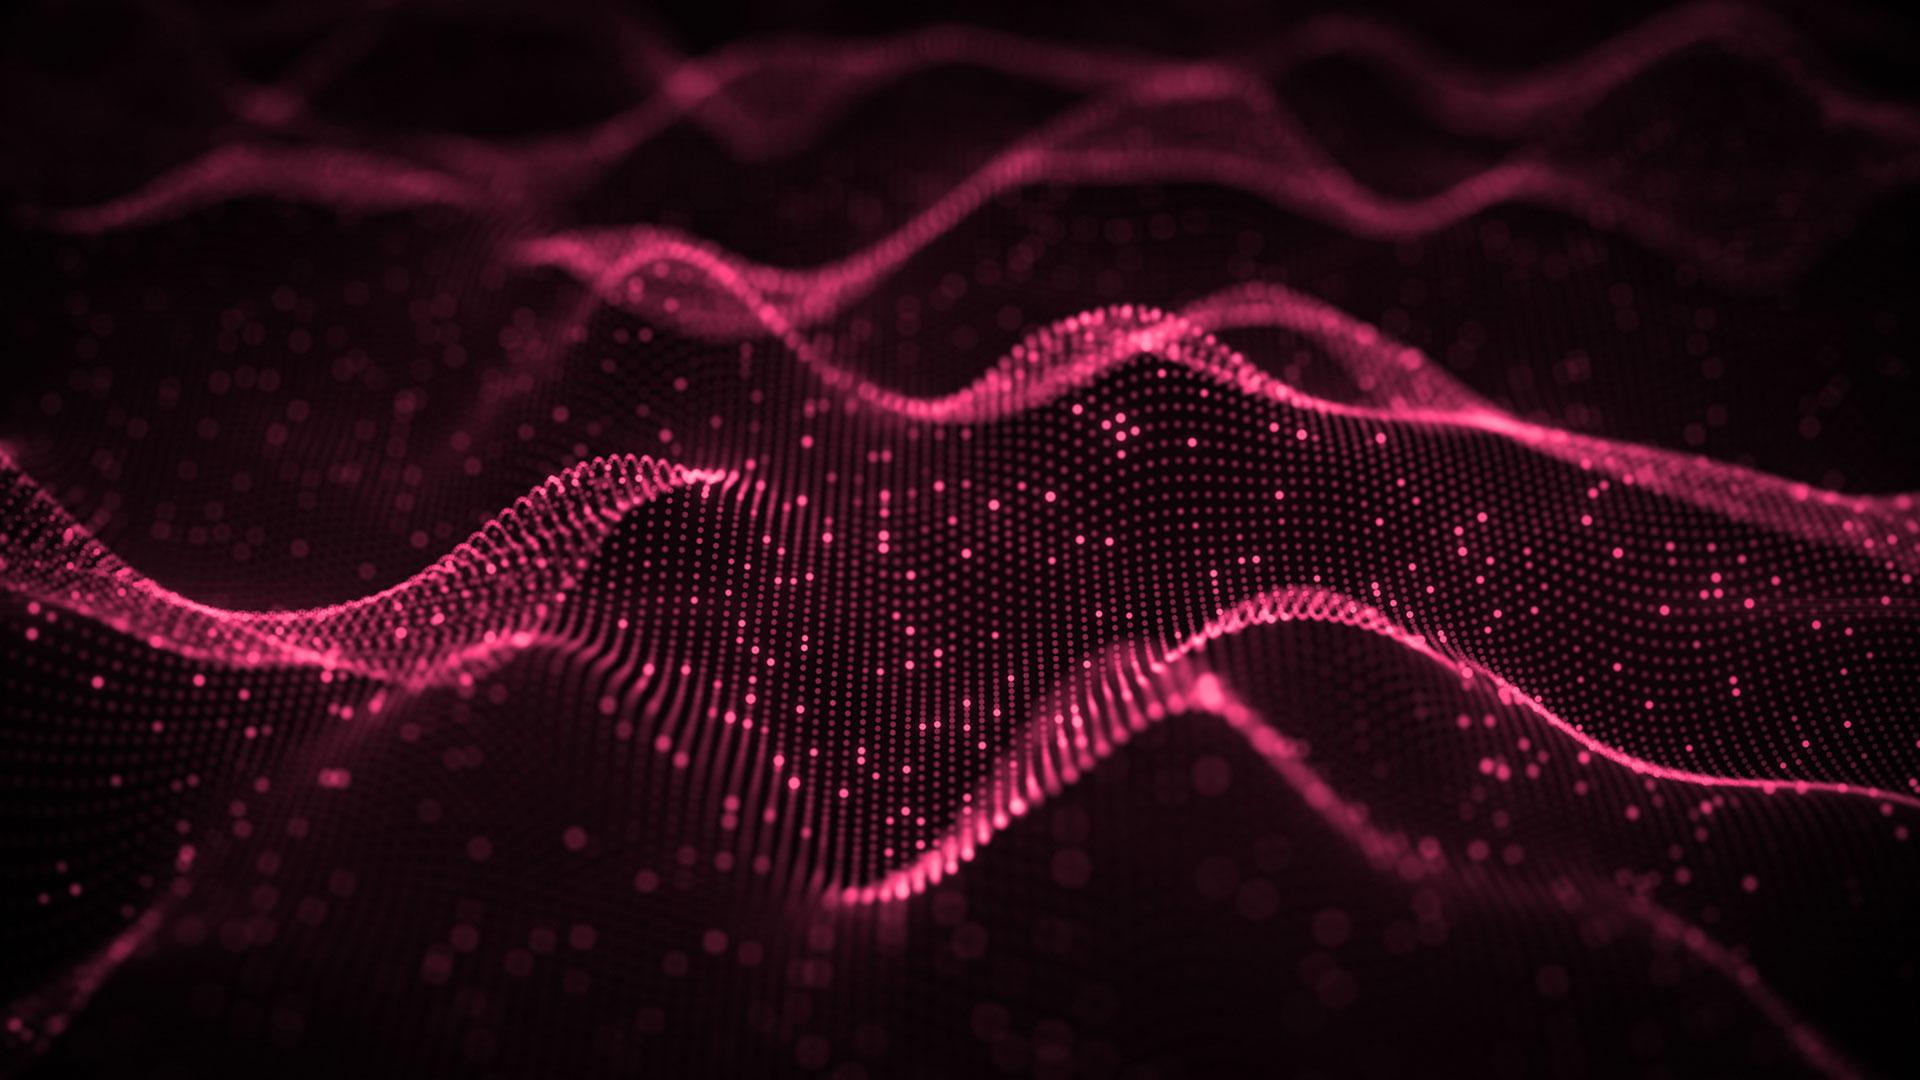 Data visualization of waves of data.